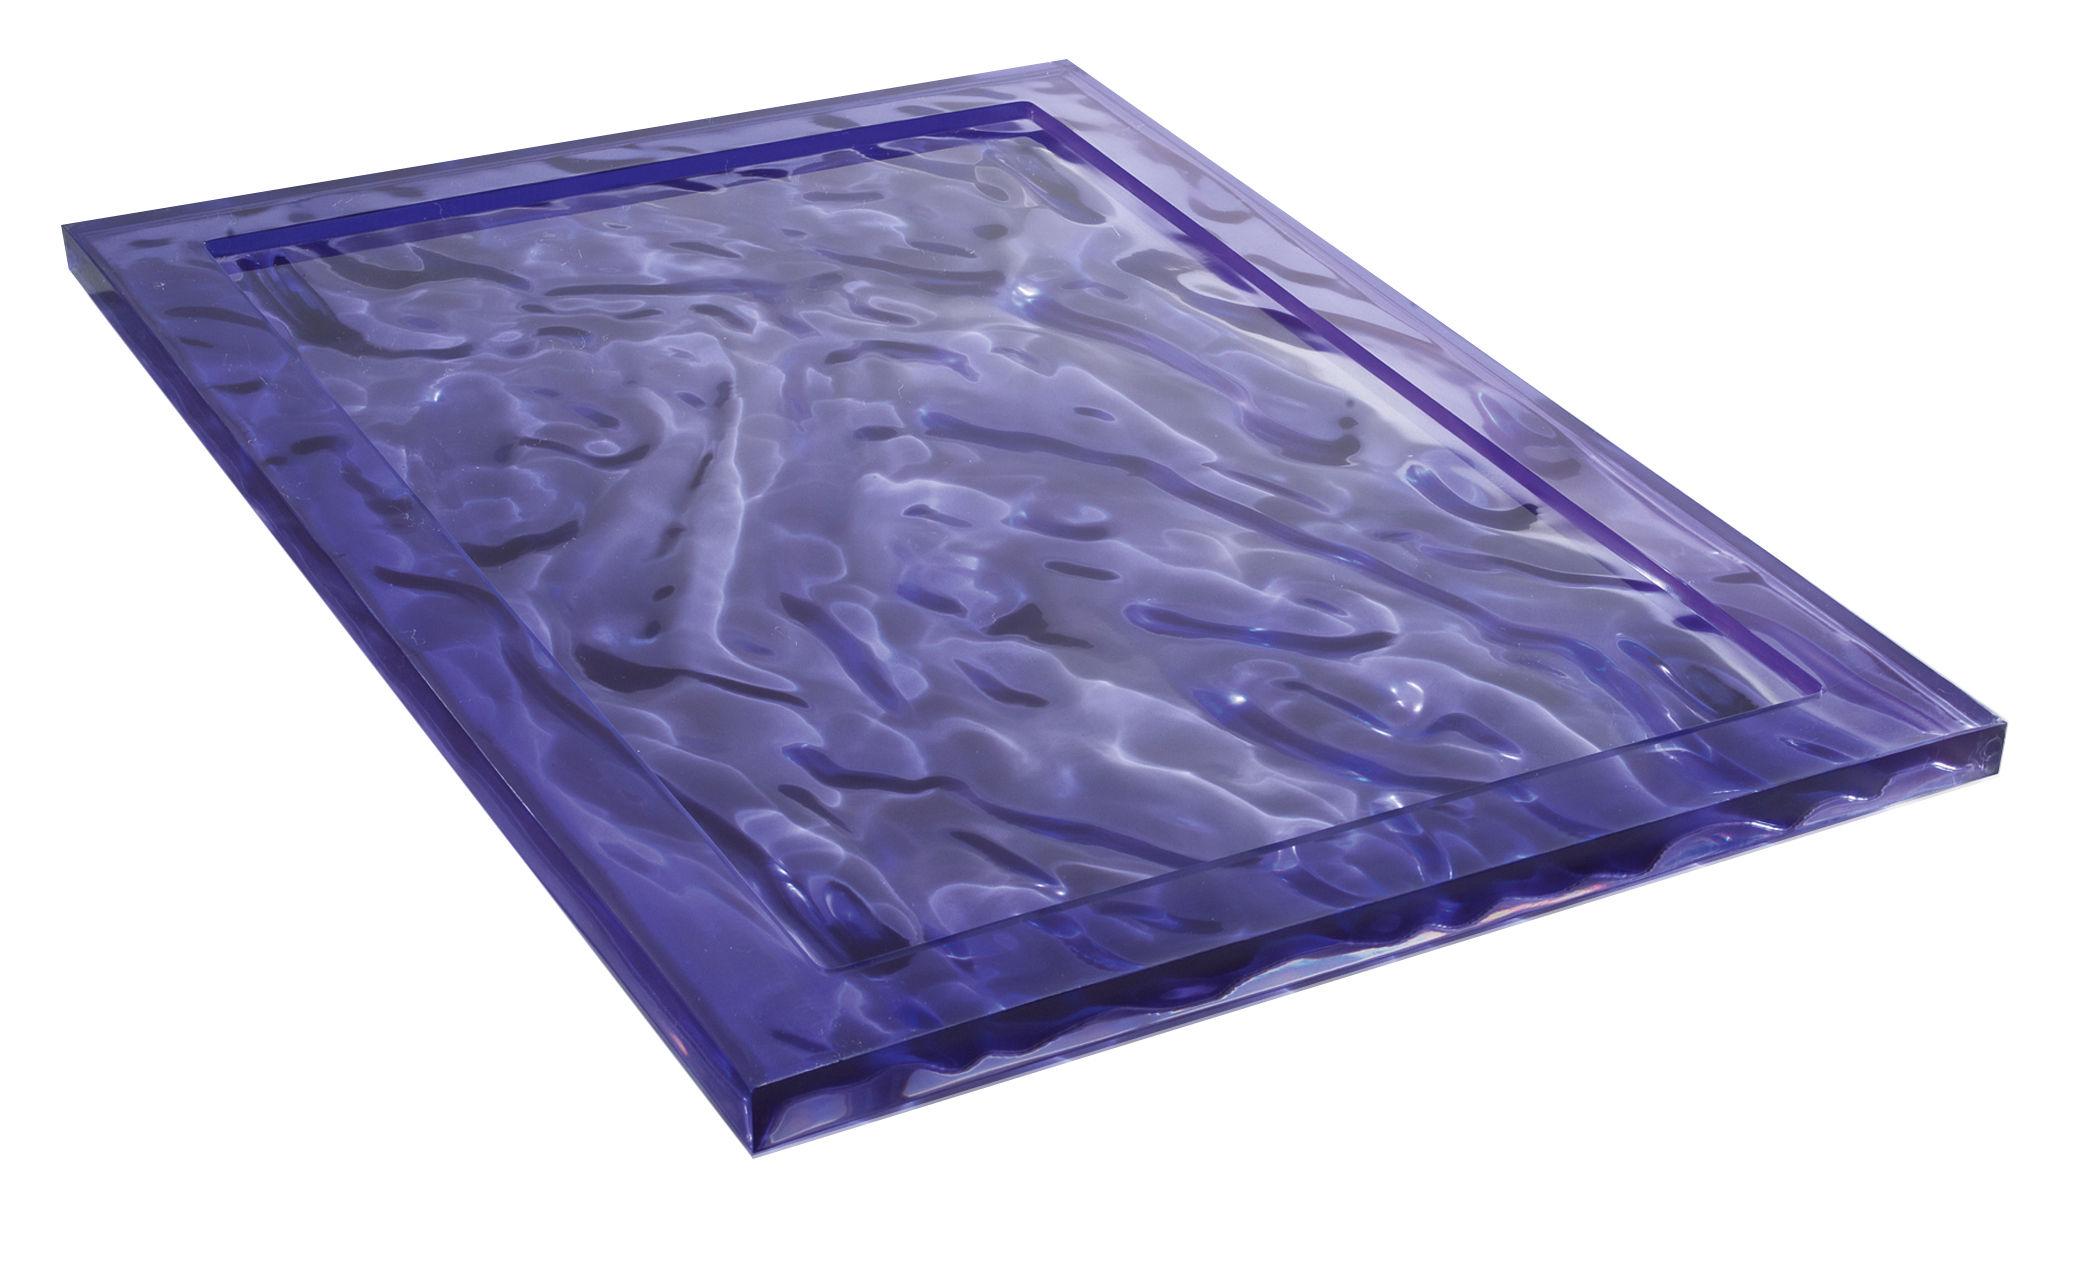 Arts de la table - Plateaux - Plateau Dune Small / 46 x 32 cm - Kartell - Fuchsia - Technopolymère